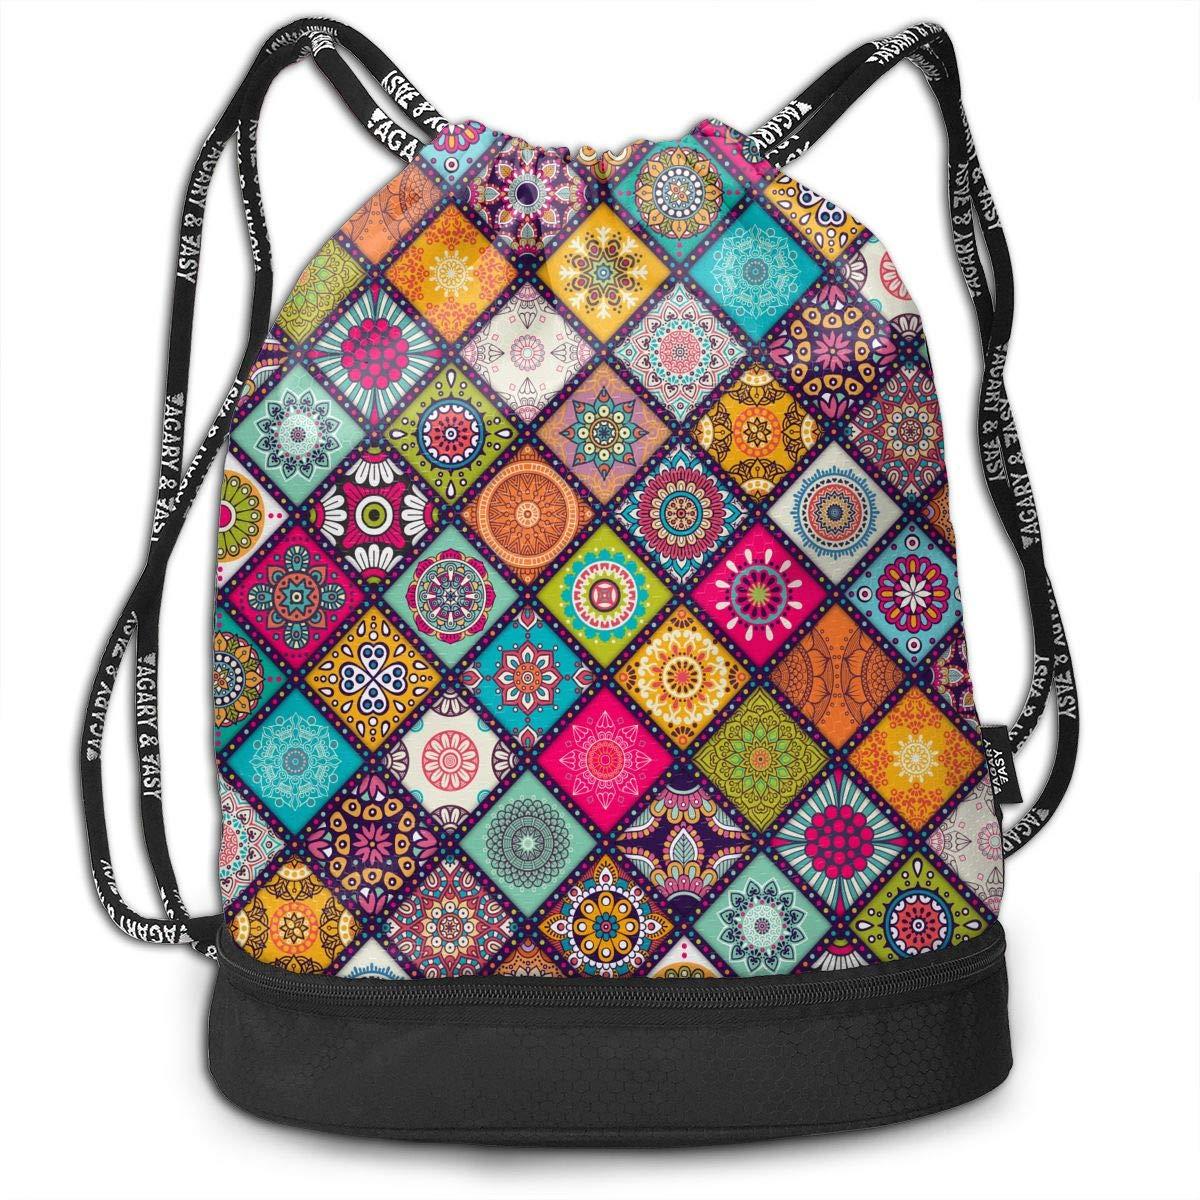 6e8c28582fd Amazon.com: Mandala Drawstring Bag Rucksack Shoulder Bags Travel Sport Gym  Bag Print - Yoga Runner Daypack Shoe Bags with Zipper and Pockets: Sports &  ...